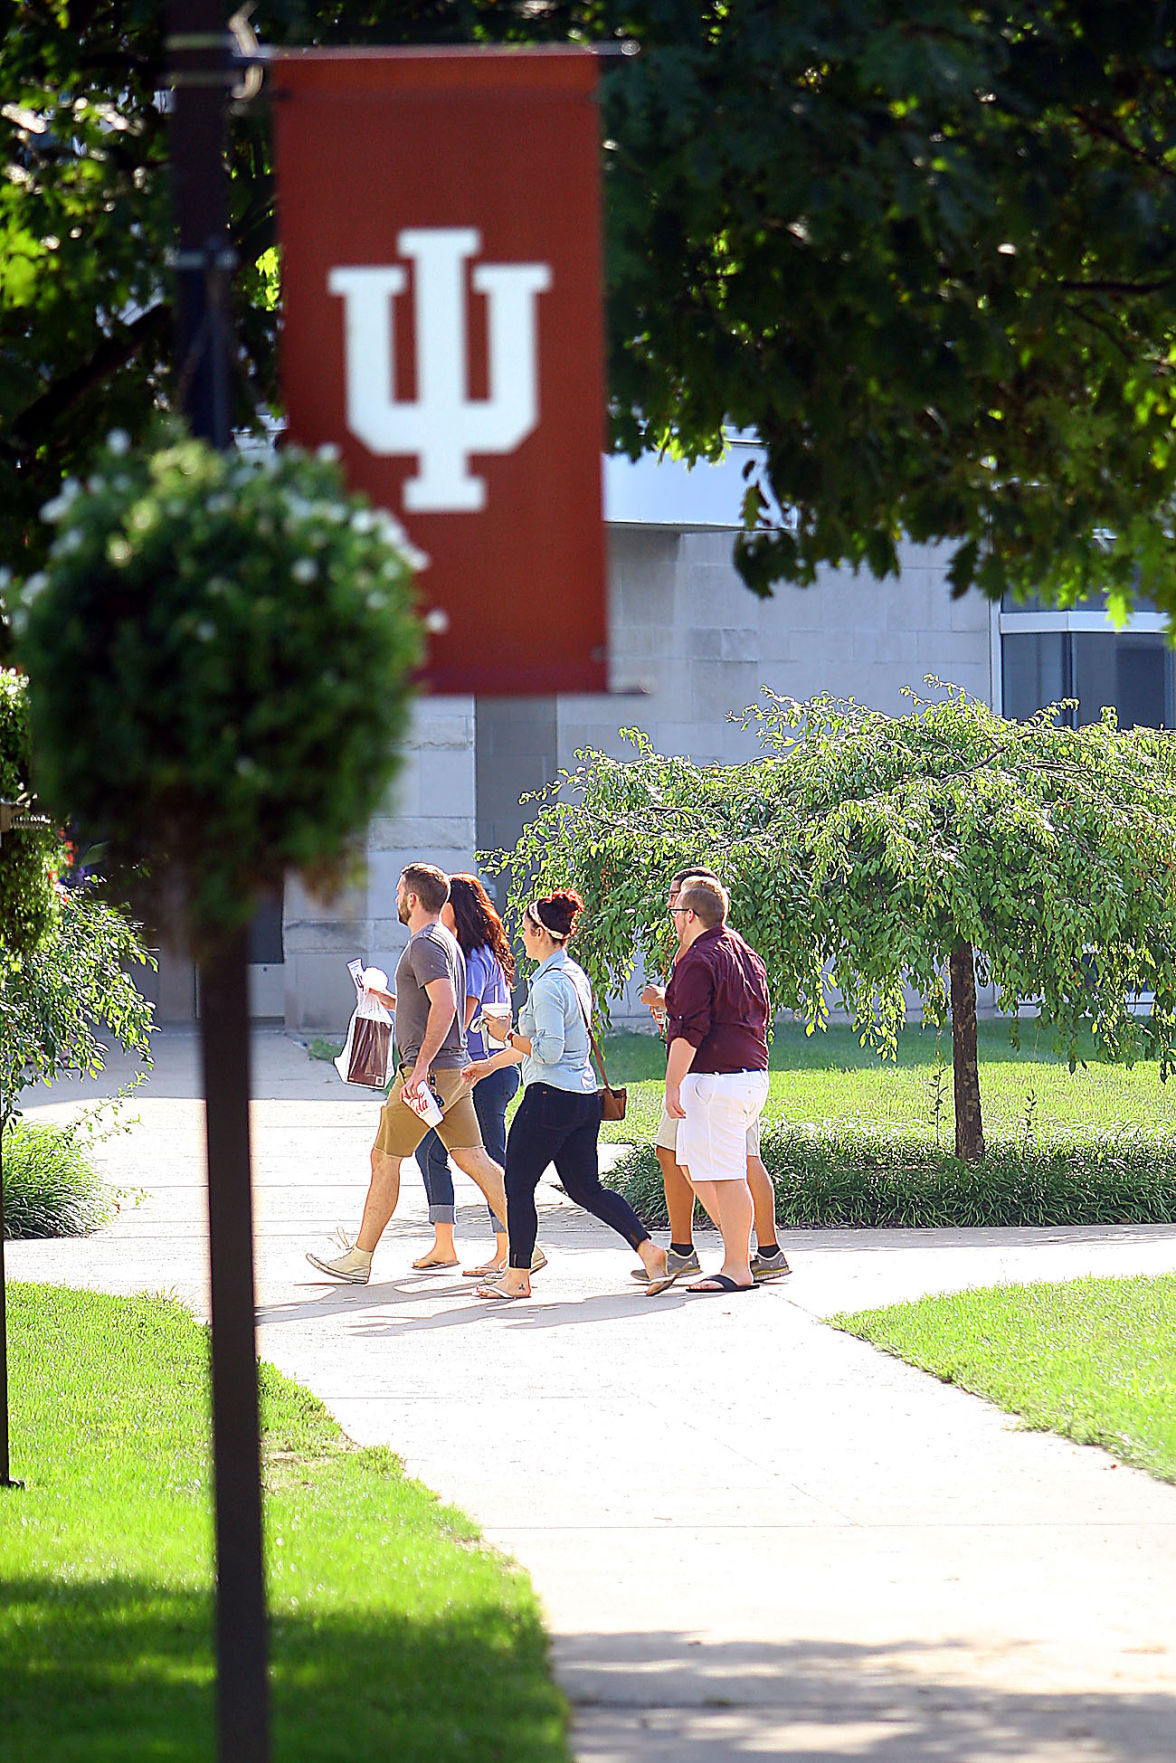 Iuk Campus Map.Iuk Ivy Tech Kick Off New Academic Year Local News